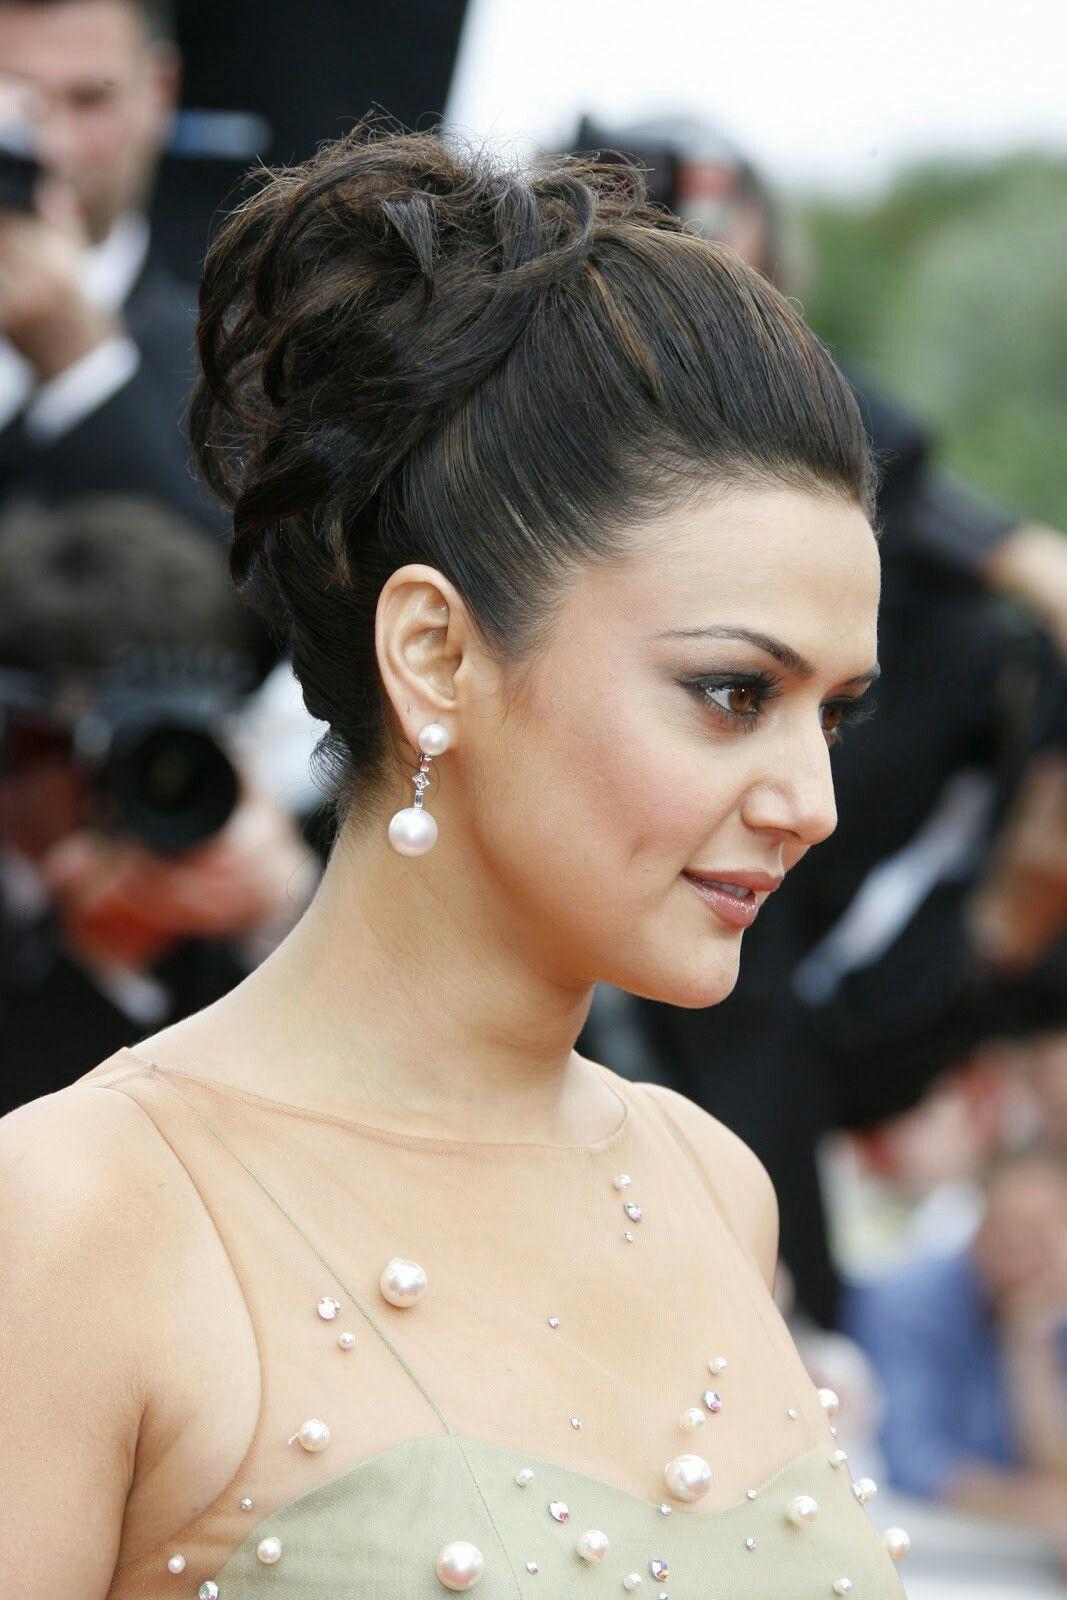 Pin By Isha On Pretty Preiti Bollywood Actress Bollywood Preity